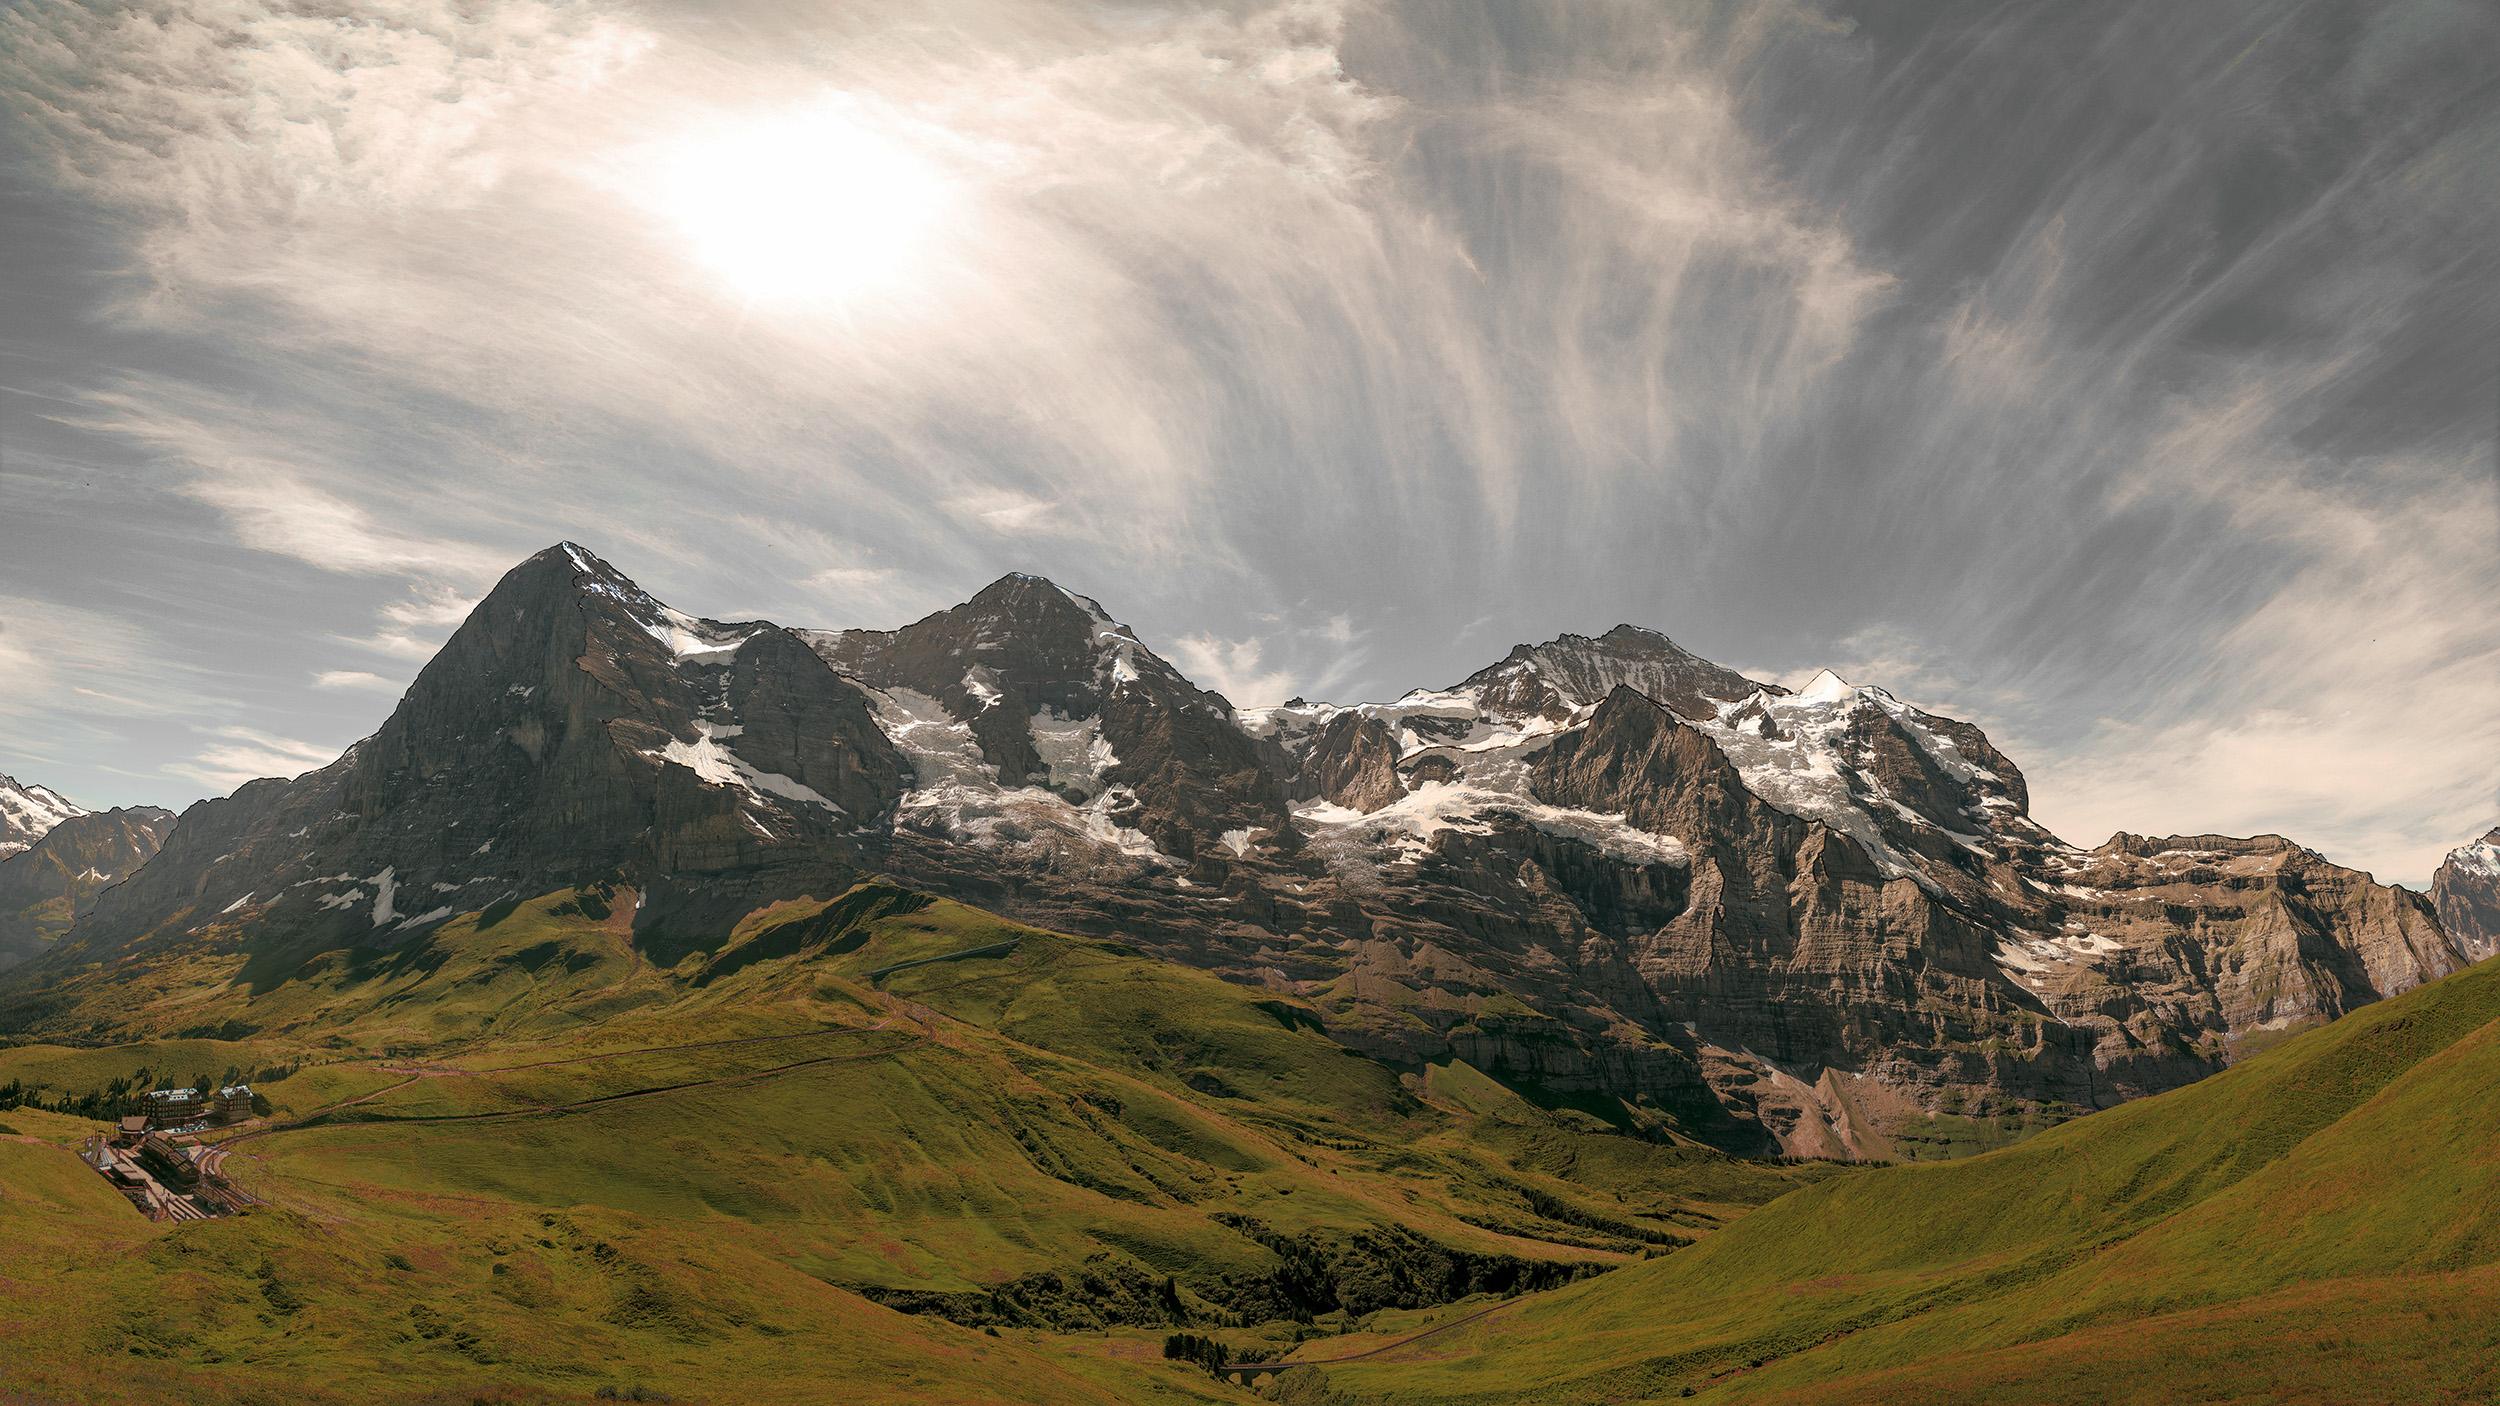 Fotografie | Eiger, Mönch and Jungfrau II, Schweiz